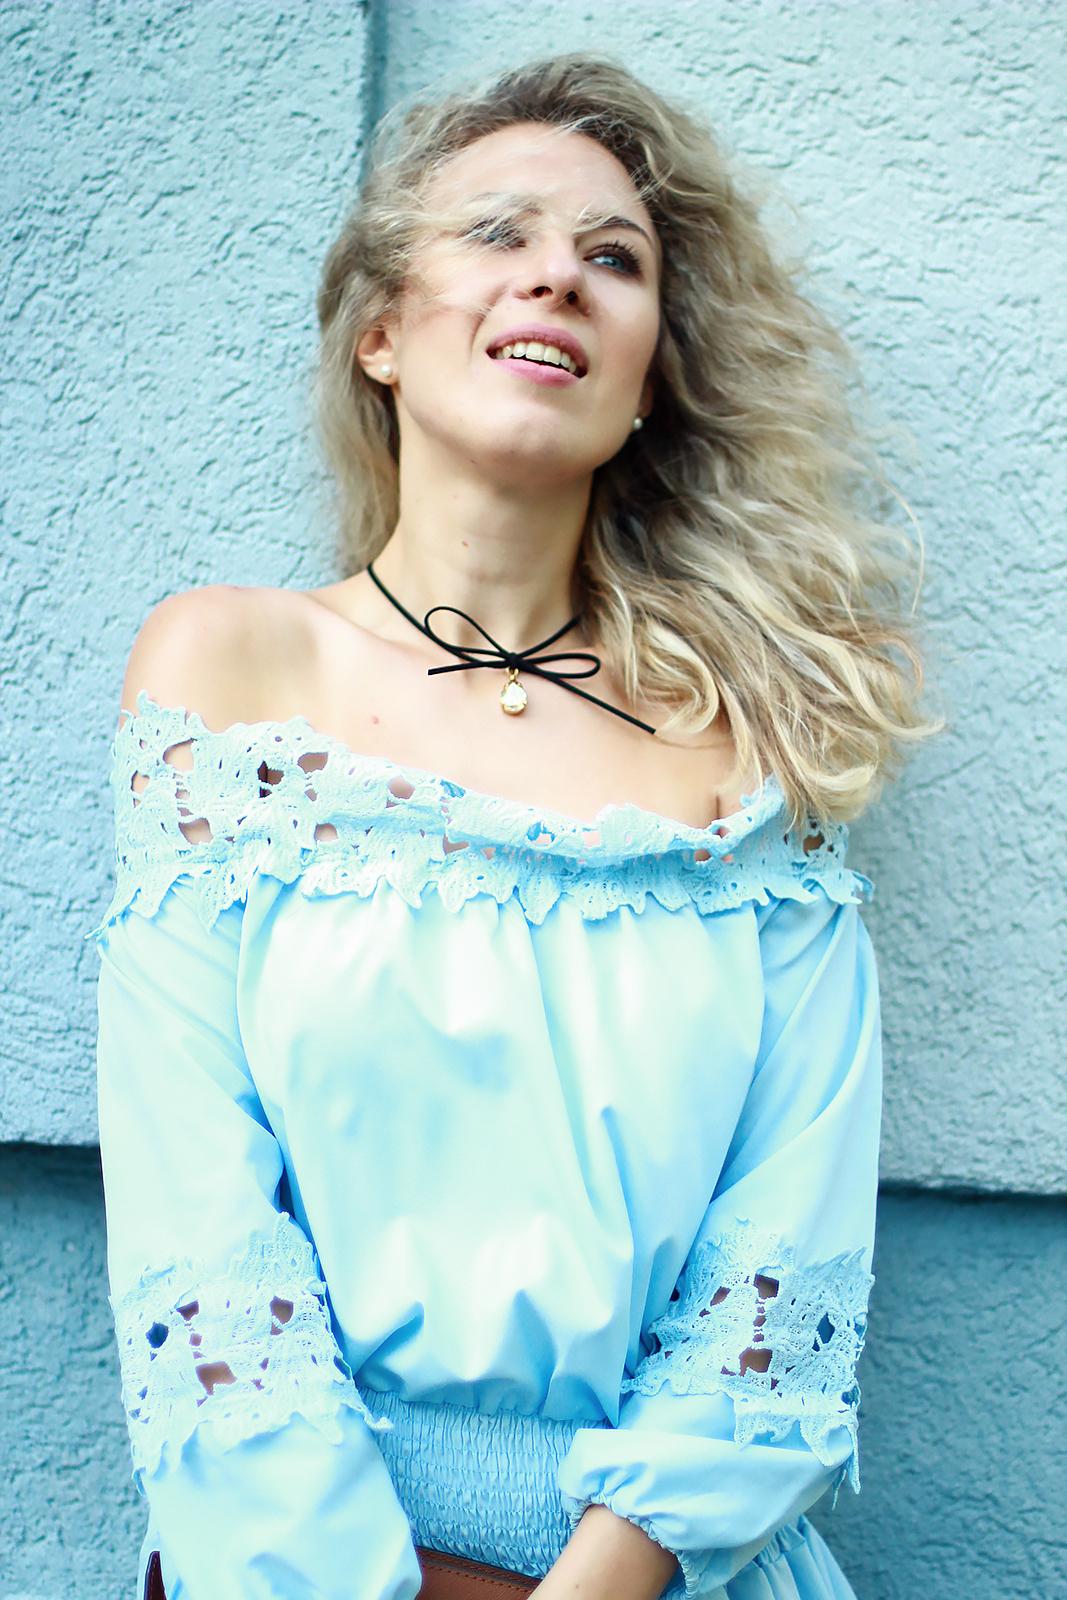 margarita_maslova_blue_dress_of_the_shoulder_dress